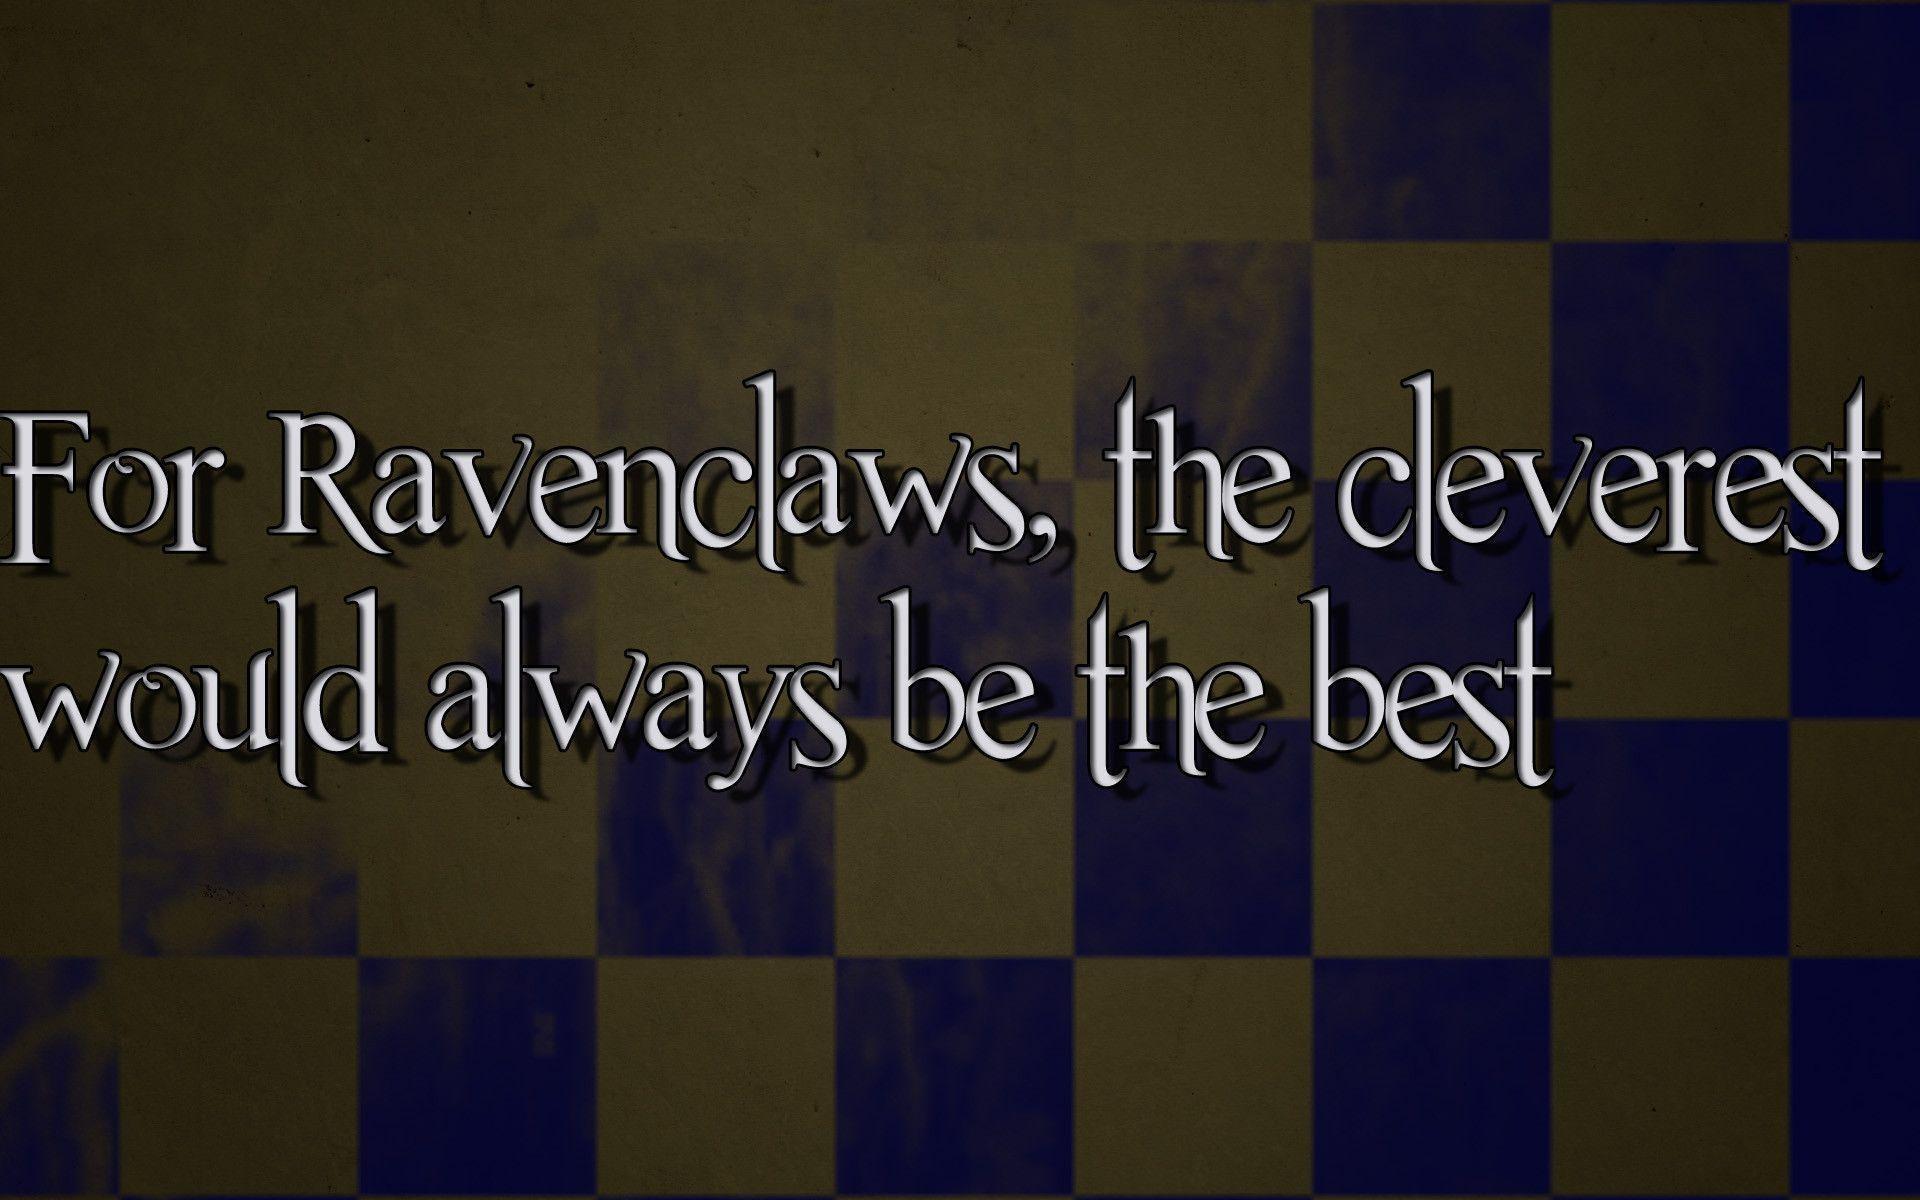 Hogwarts House Wallpaper : Ravenclaw by TheLadyAvatar on DeviantArt